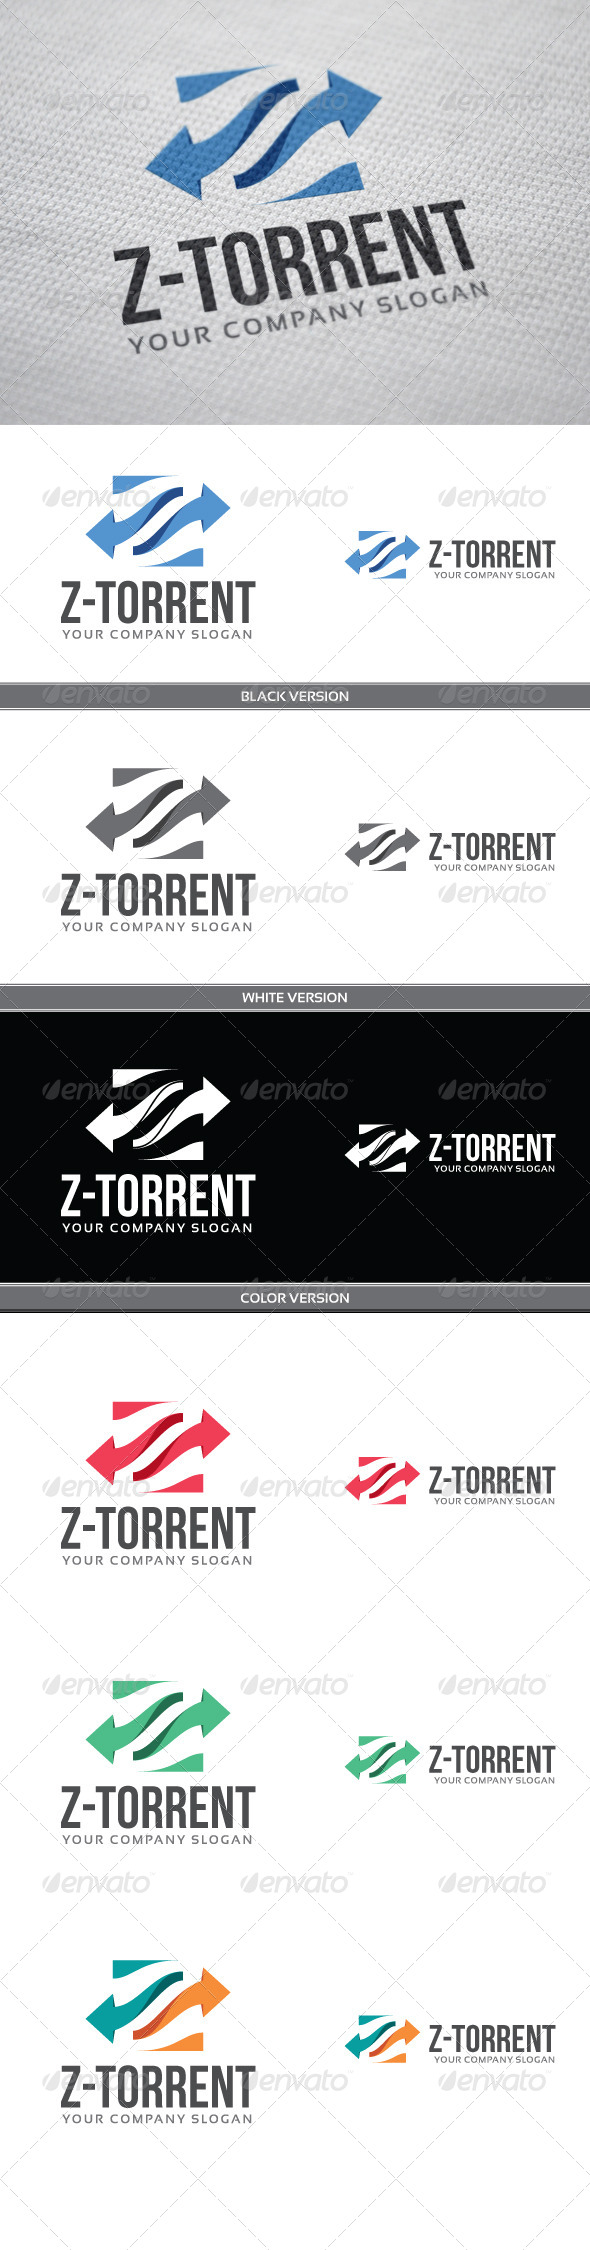 GraphicRiver Z-torrent 4065942